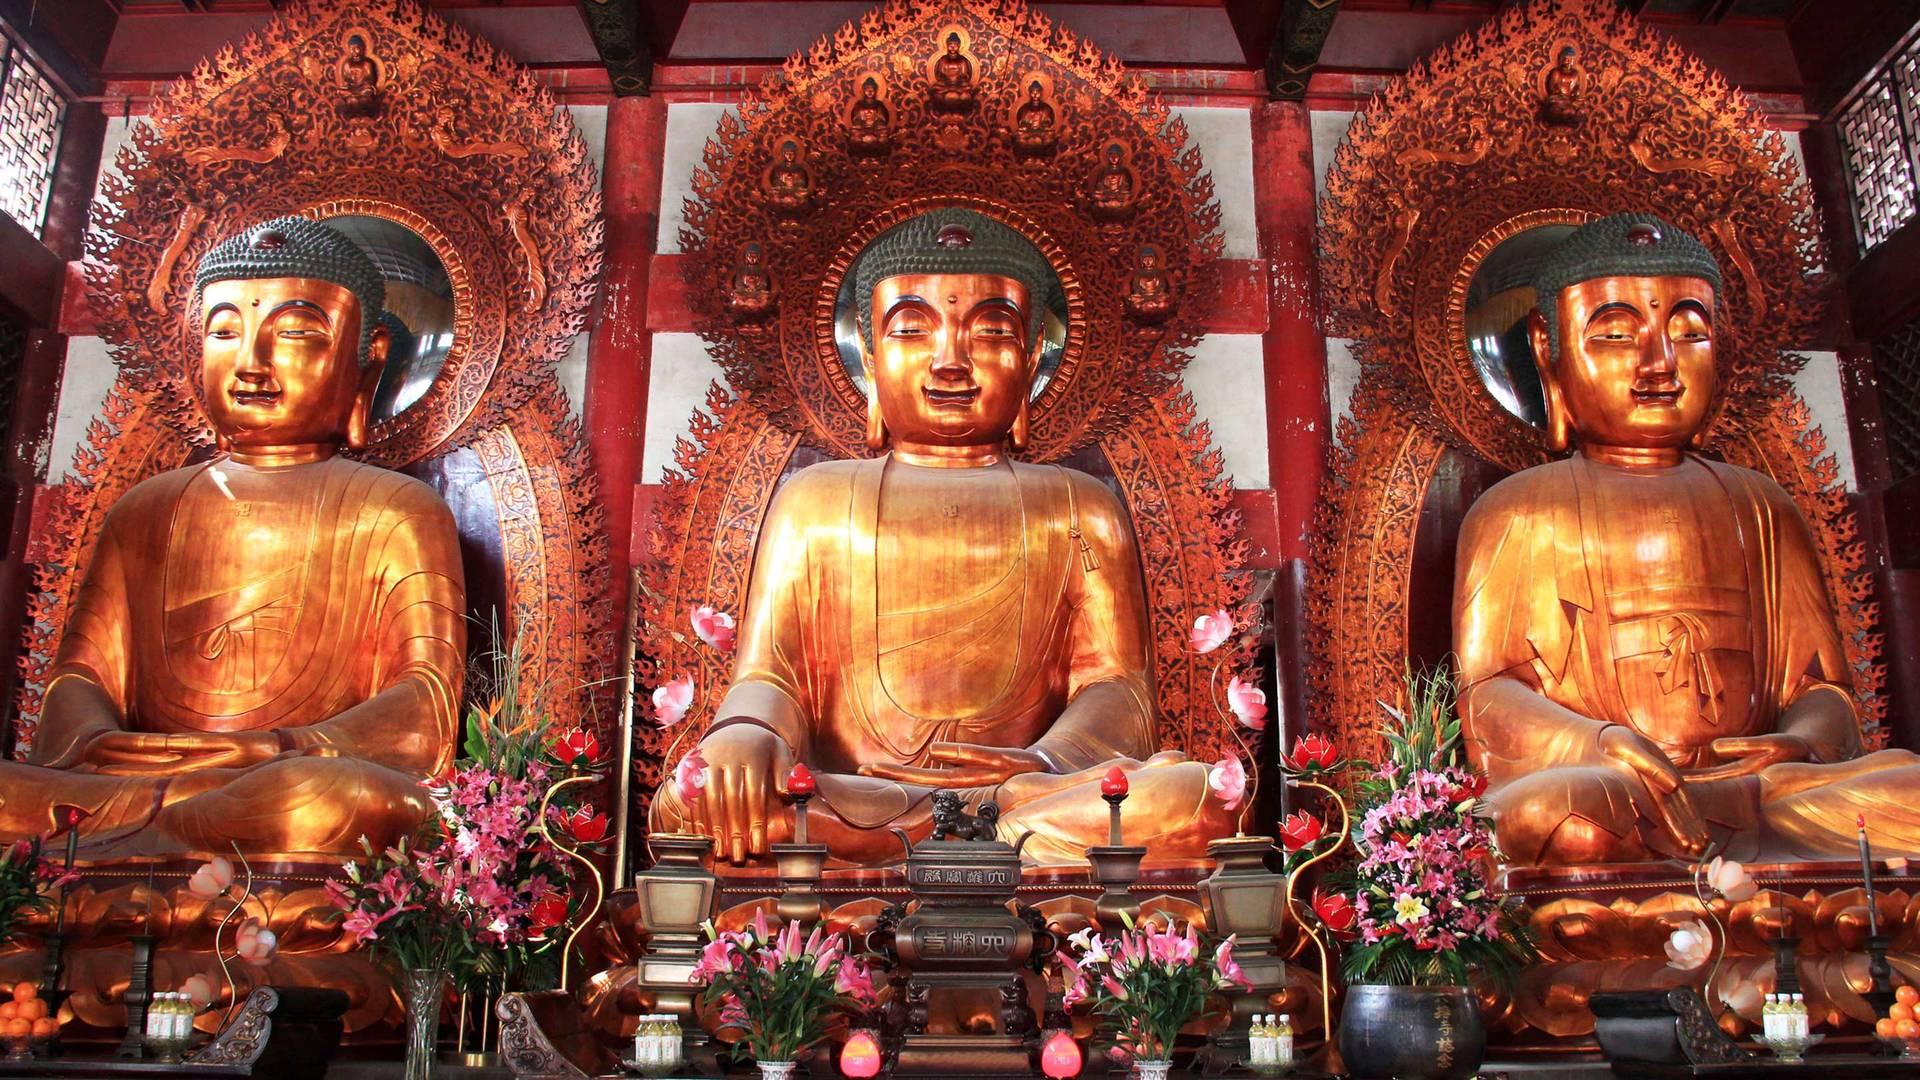 Sculpture of the Buddha in Guangzhou